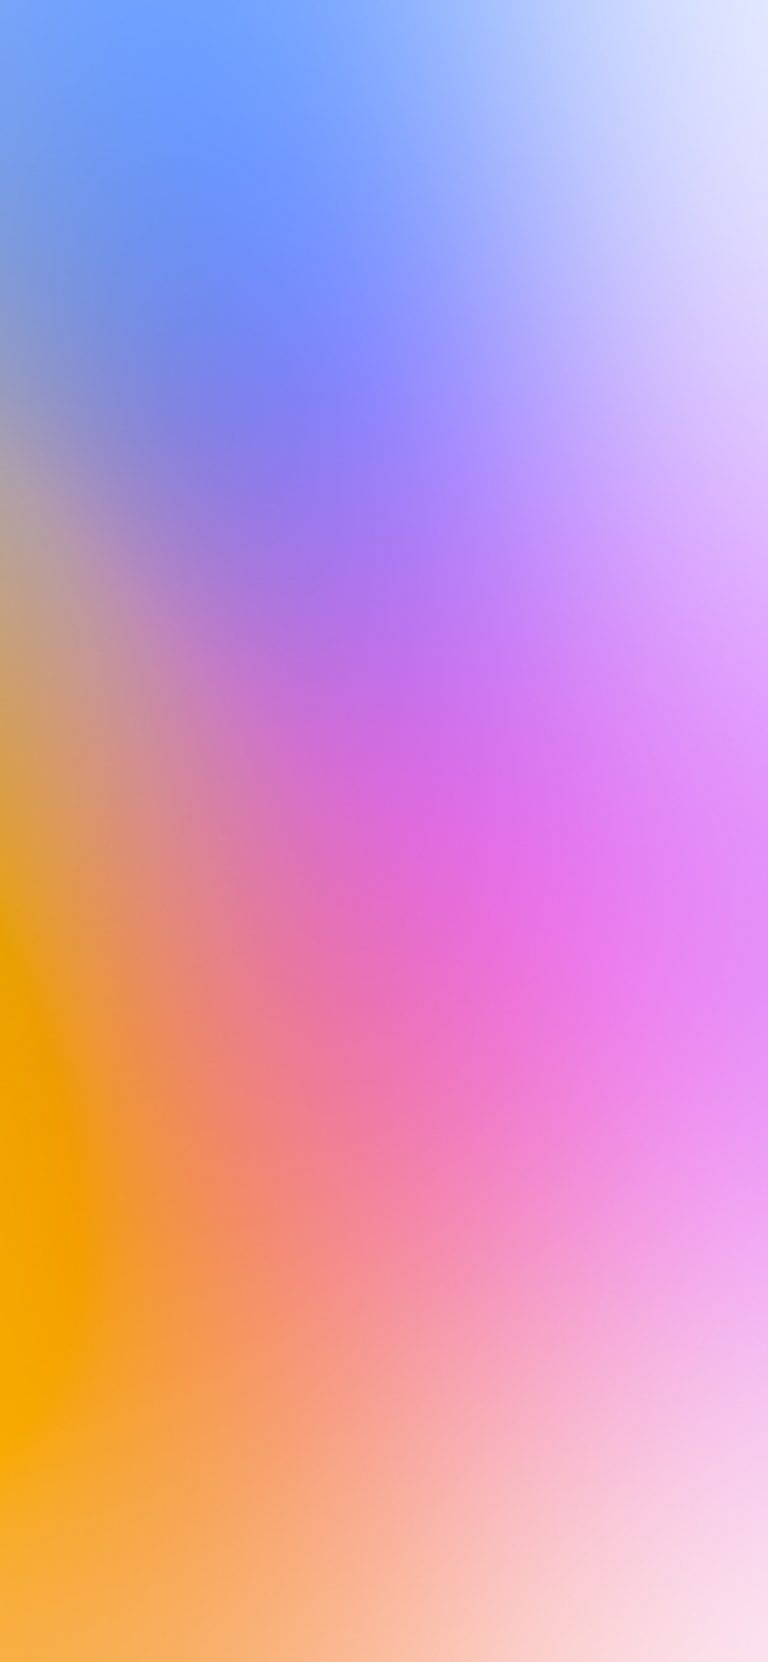 Apple Card Wallpaper 03 1242x2688 768x1662